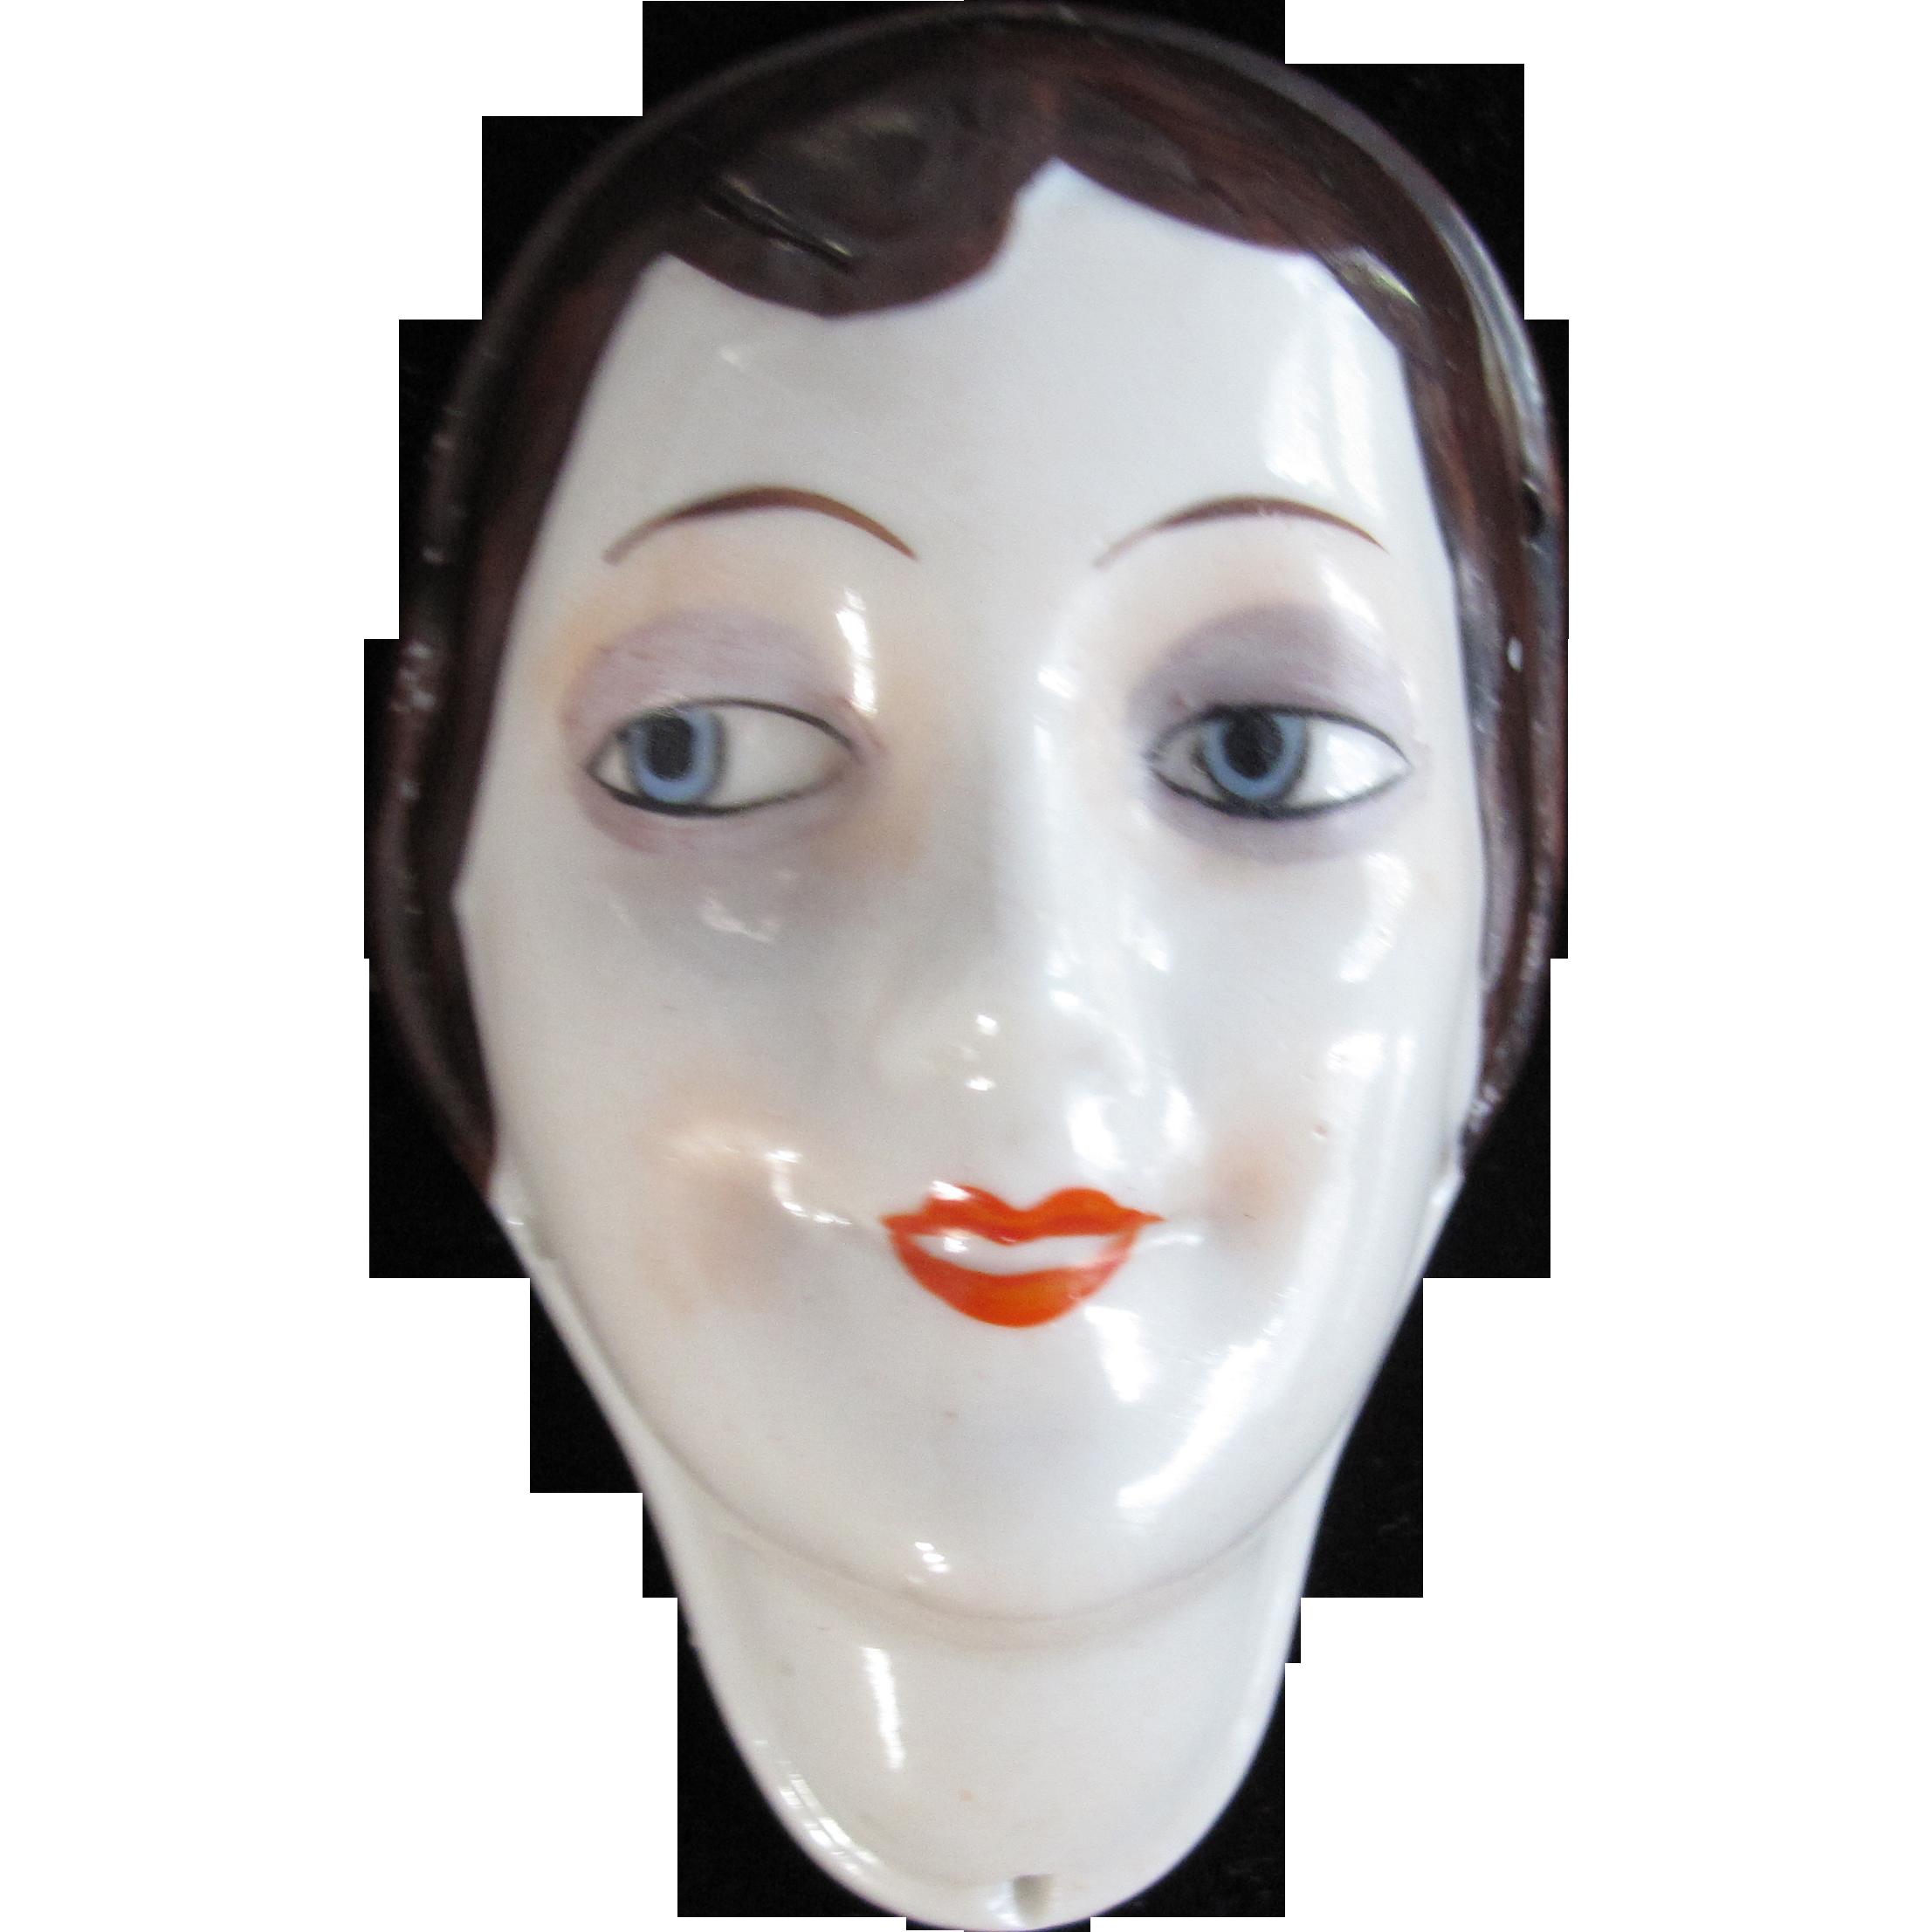 German Hankie Press Half Doll Face Book Piece From